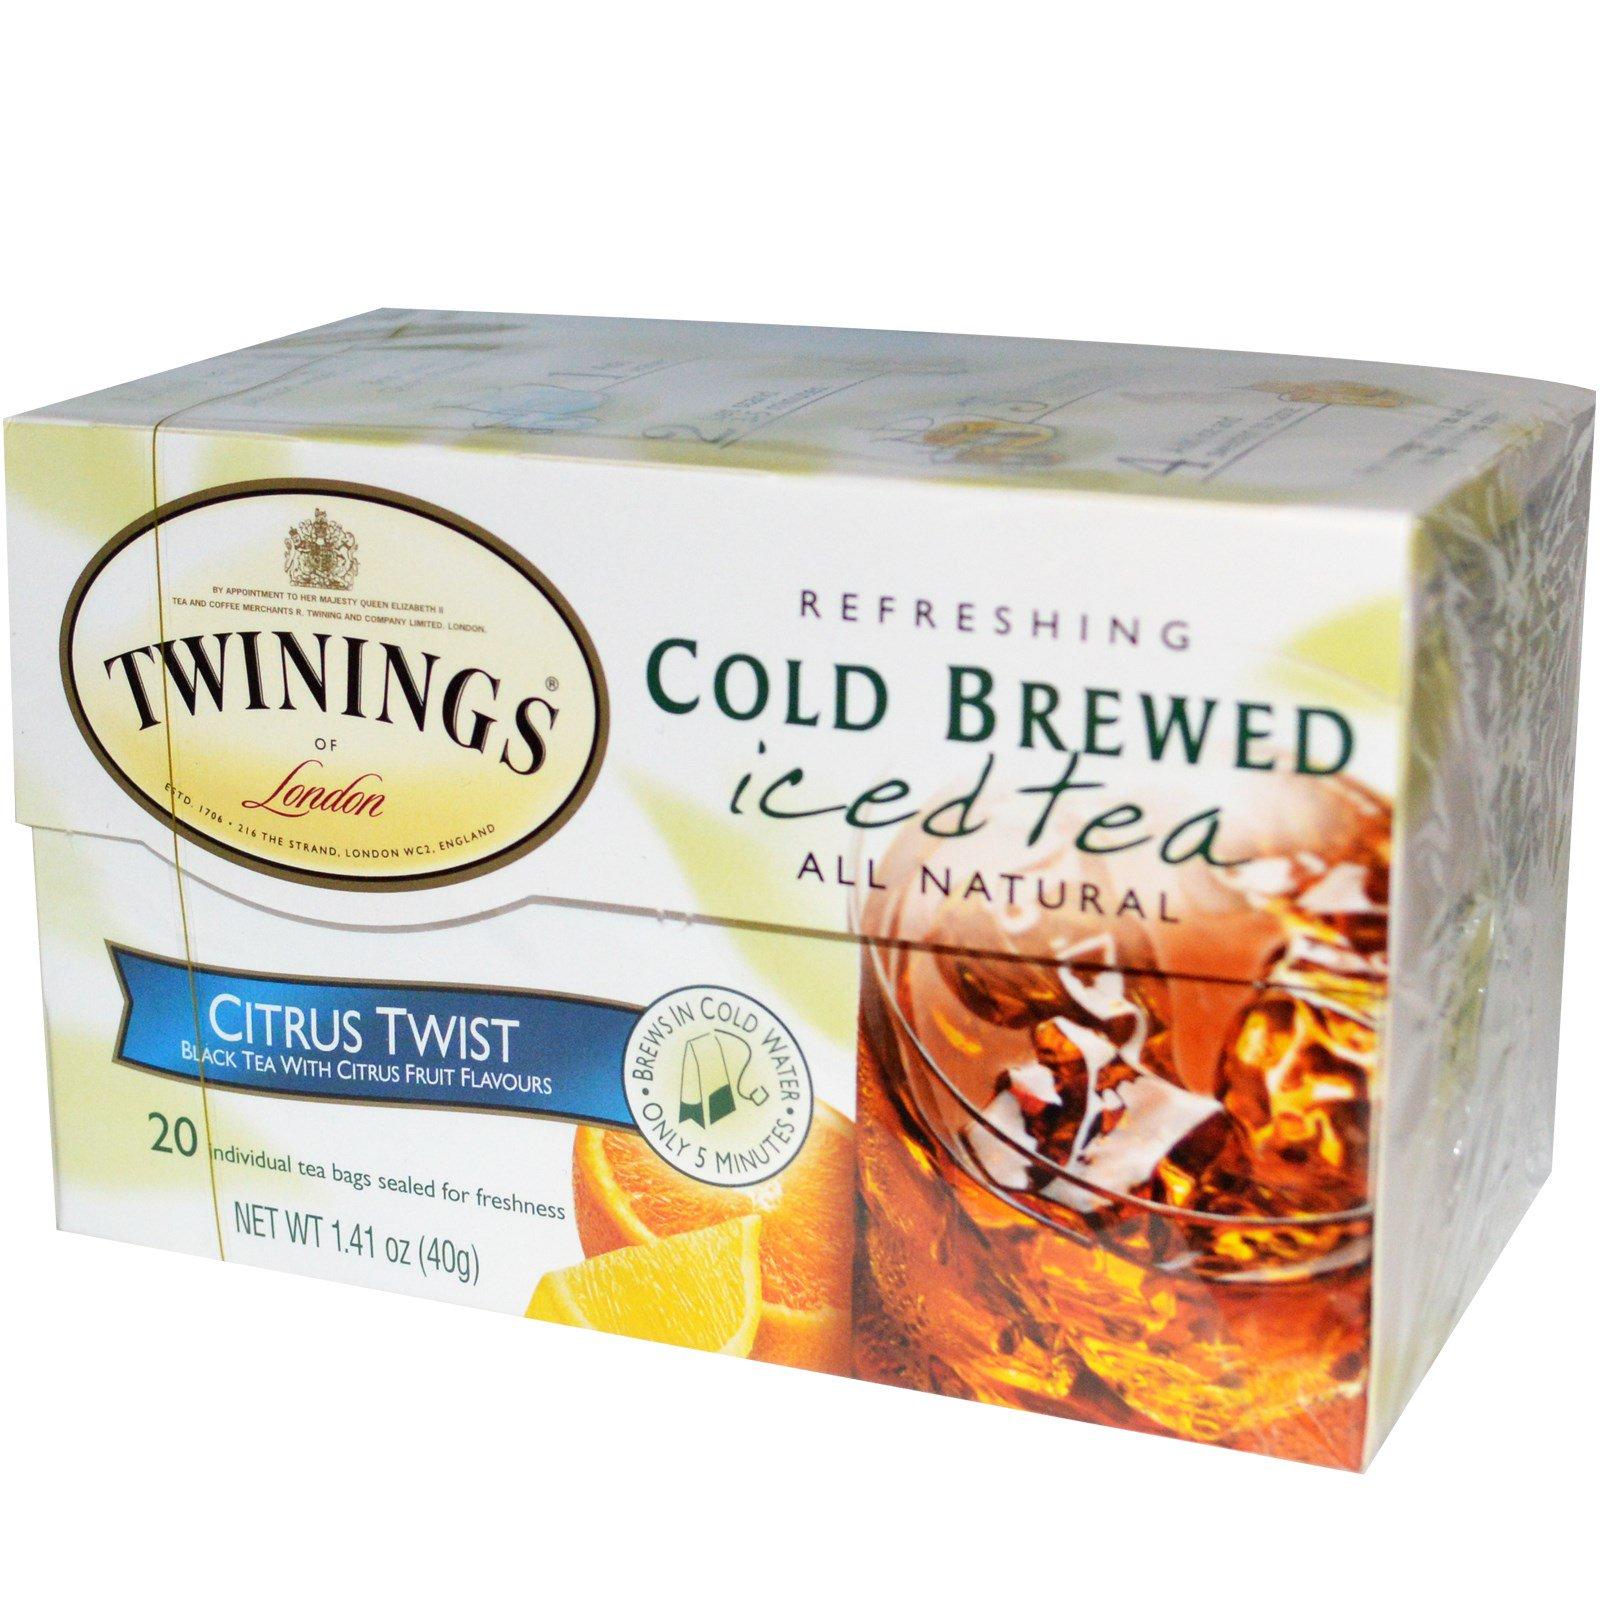 Twinings Cold Brewed Iced Tea Citrus Twist 20 Bags 1 41 Oz